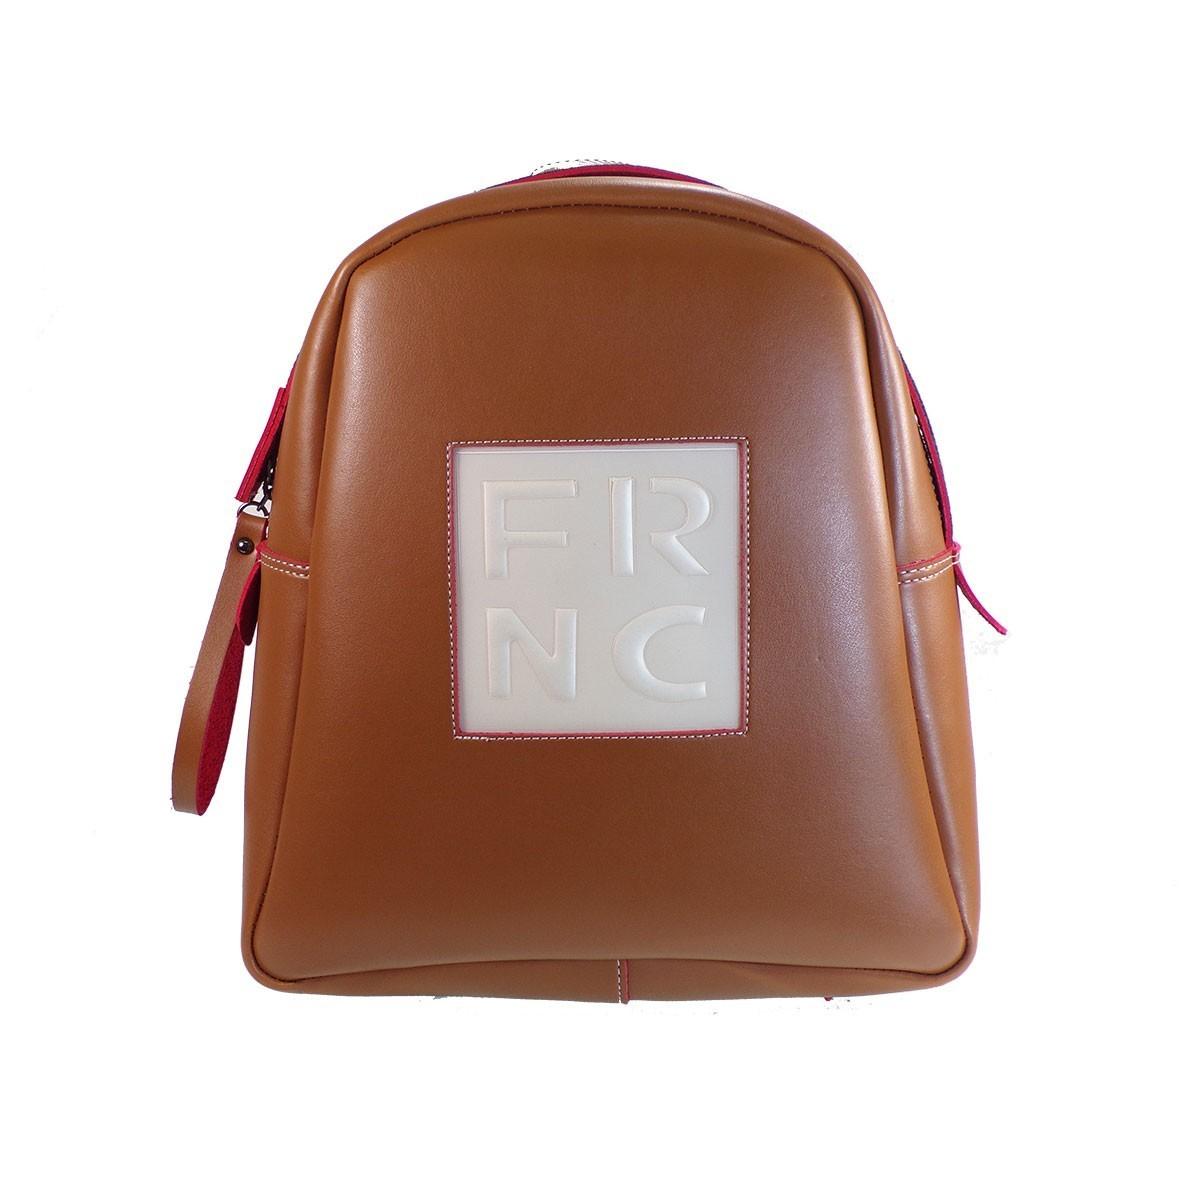 80870406ba FRNC FRANCESCO Τσάντα Γυναικεία Πλάτης-Backpack 1202 Ταμπά Δέρμα ...